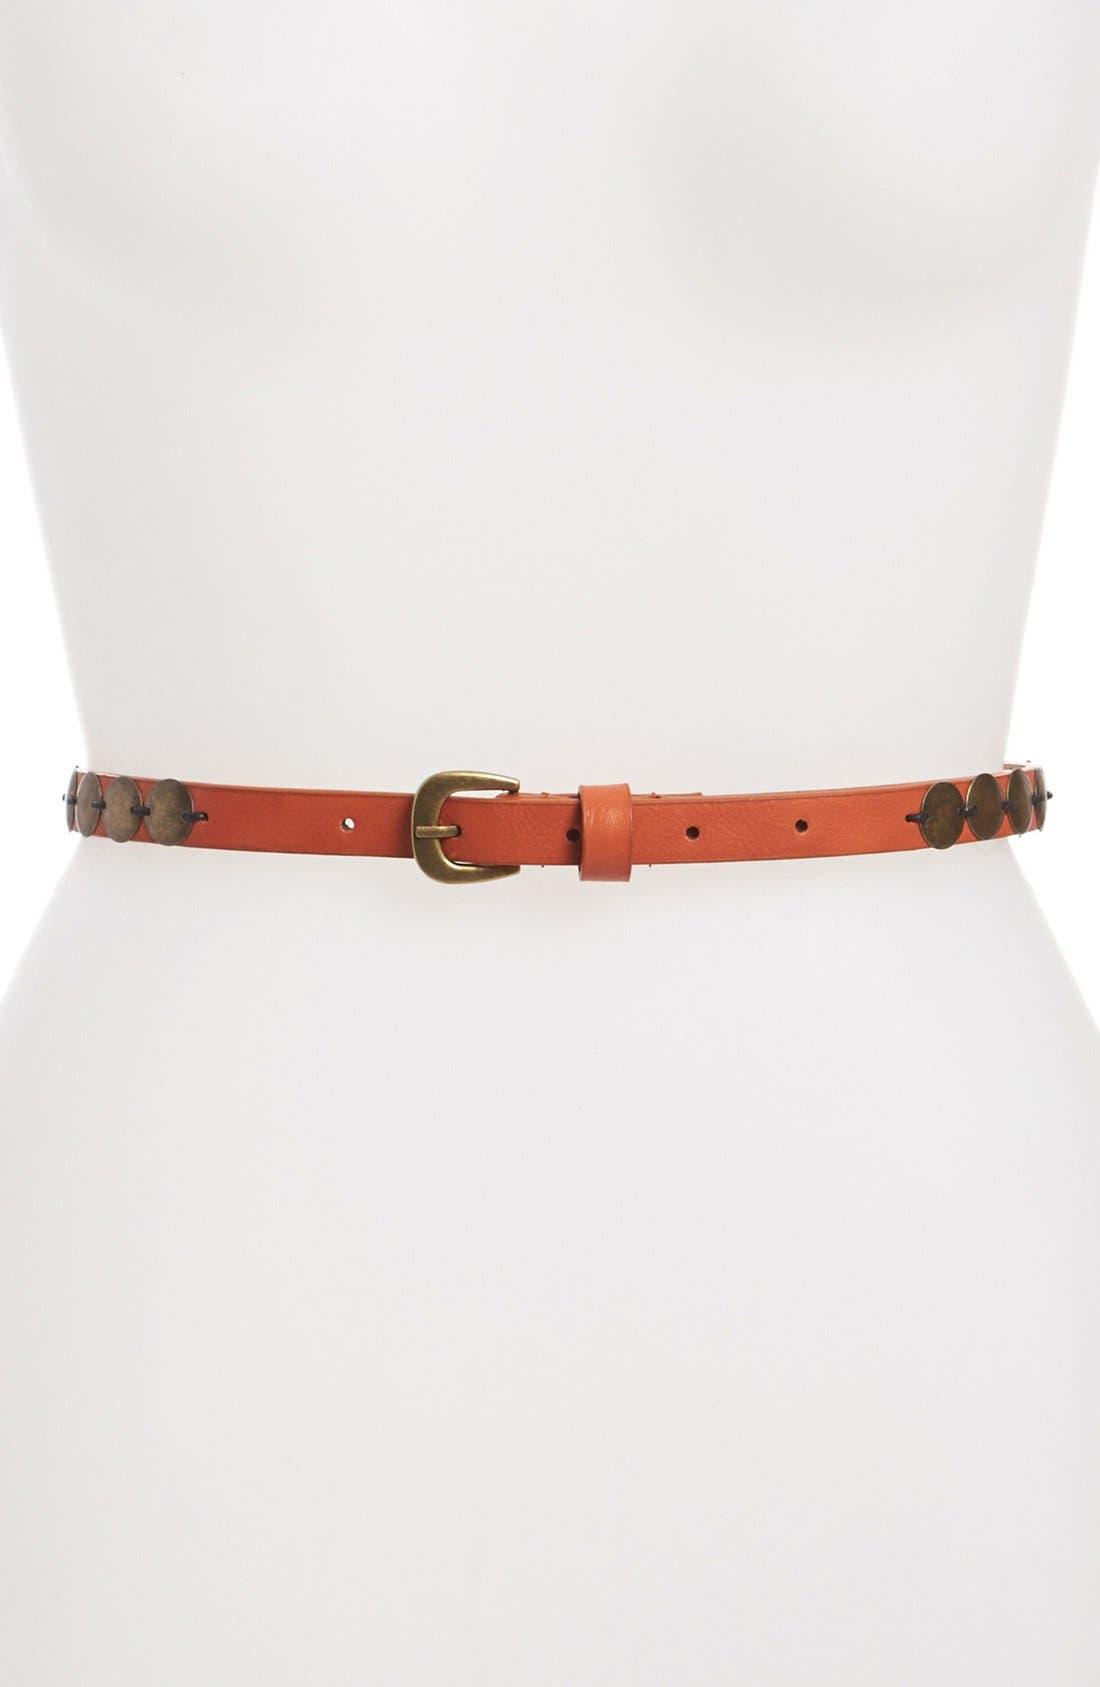 Alternate Image 1 Selected - Belgo Lux Studded Skinny  Belt